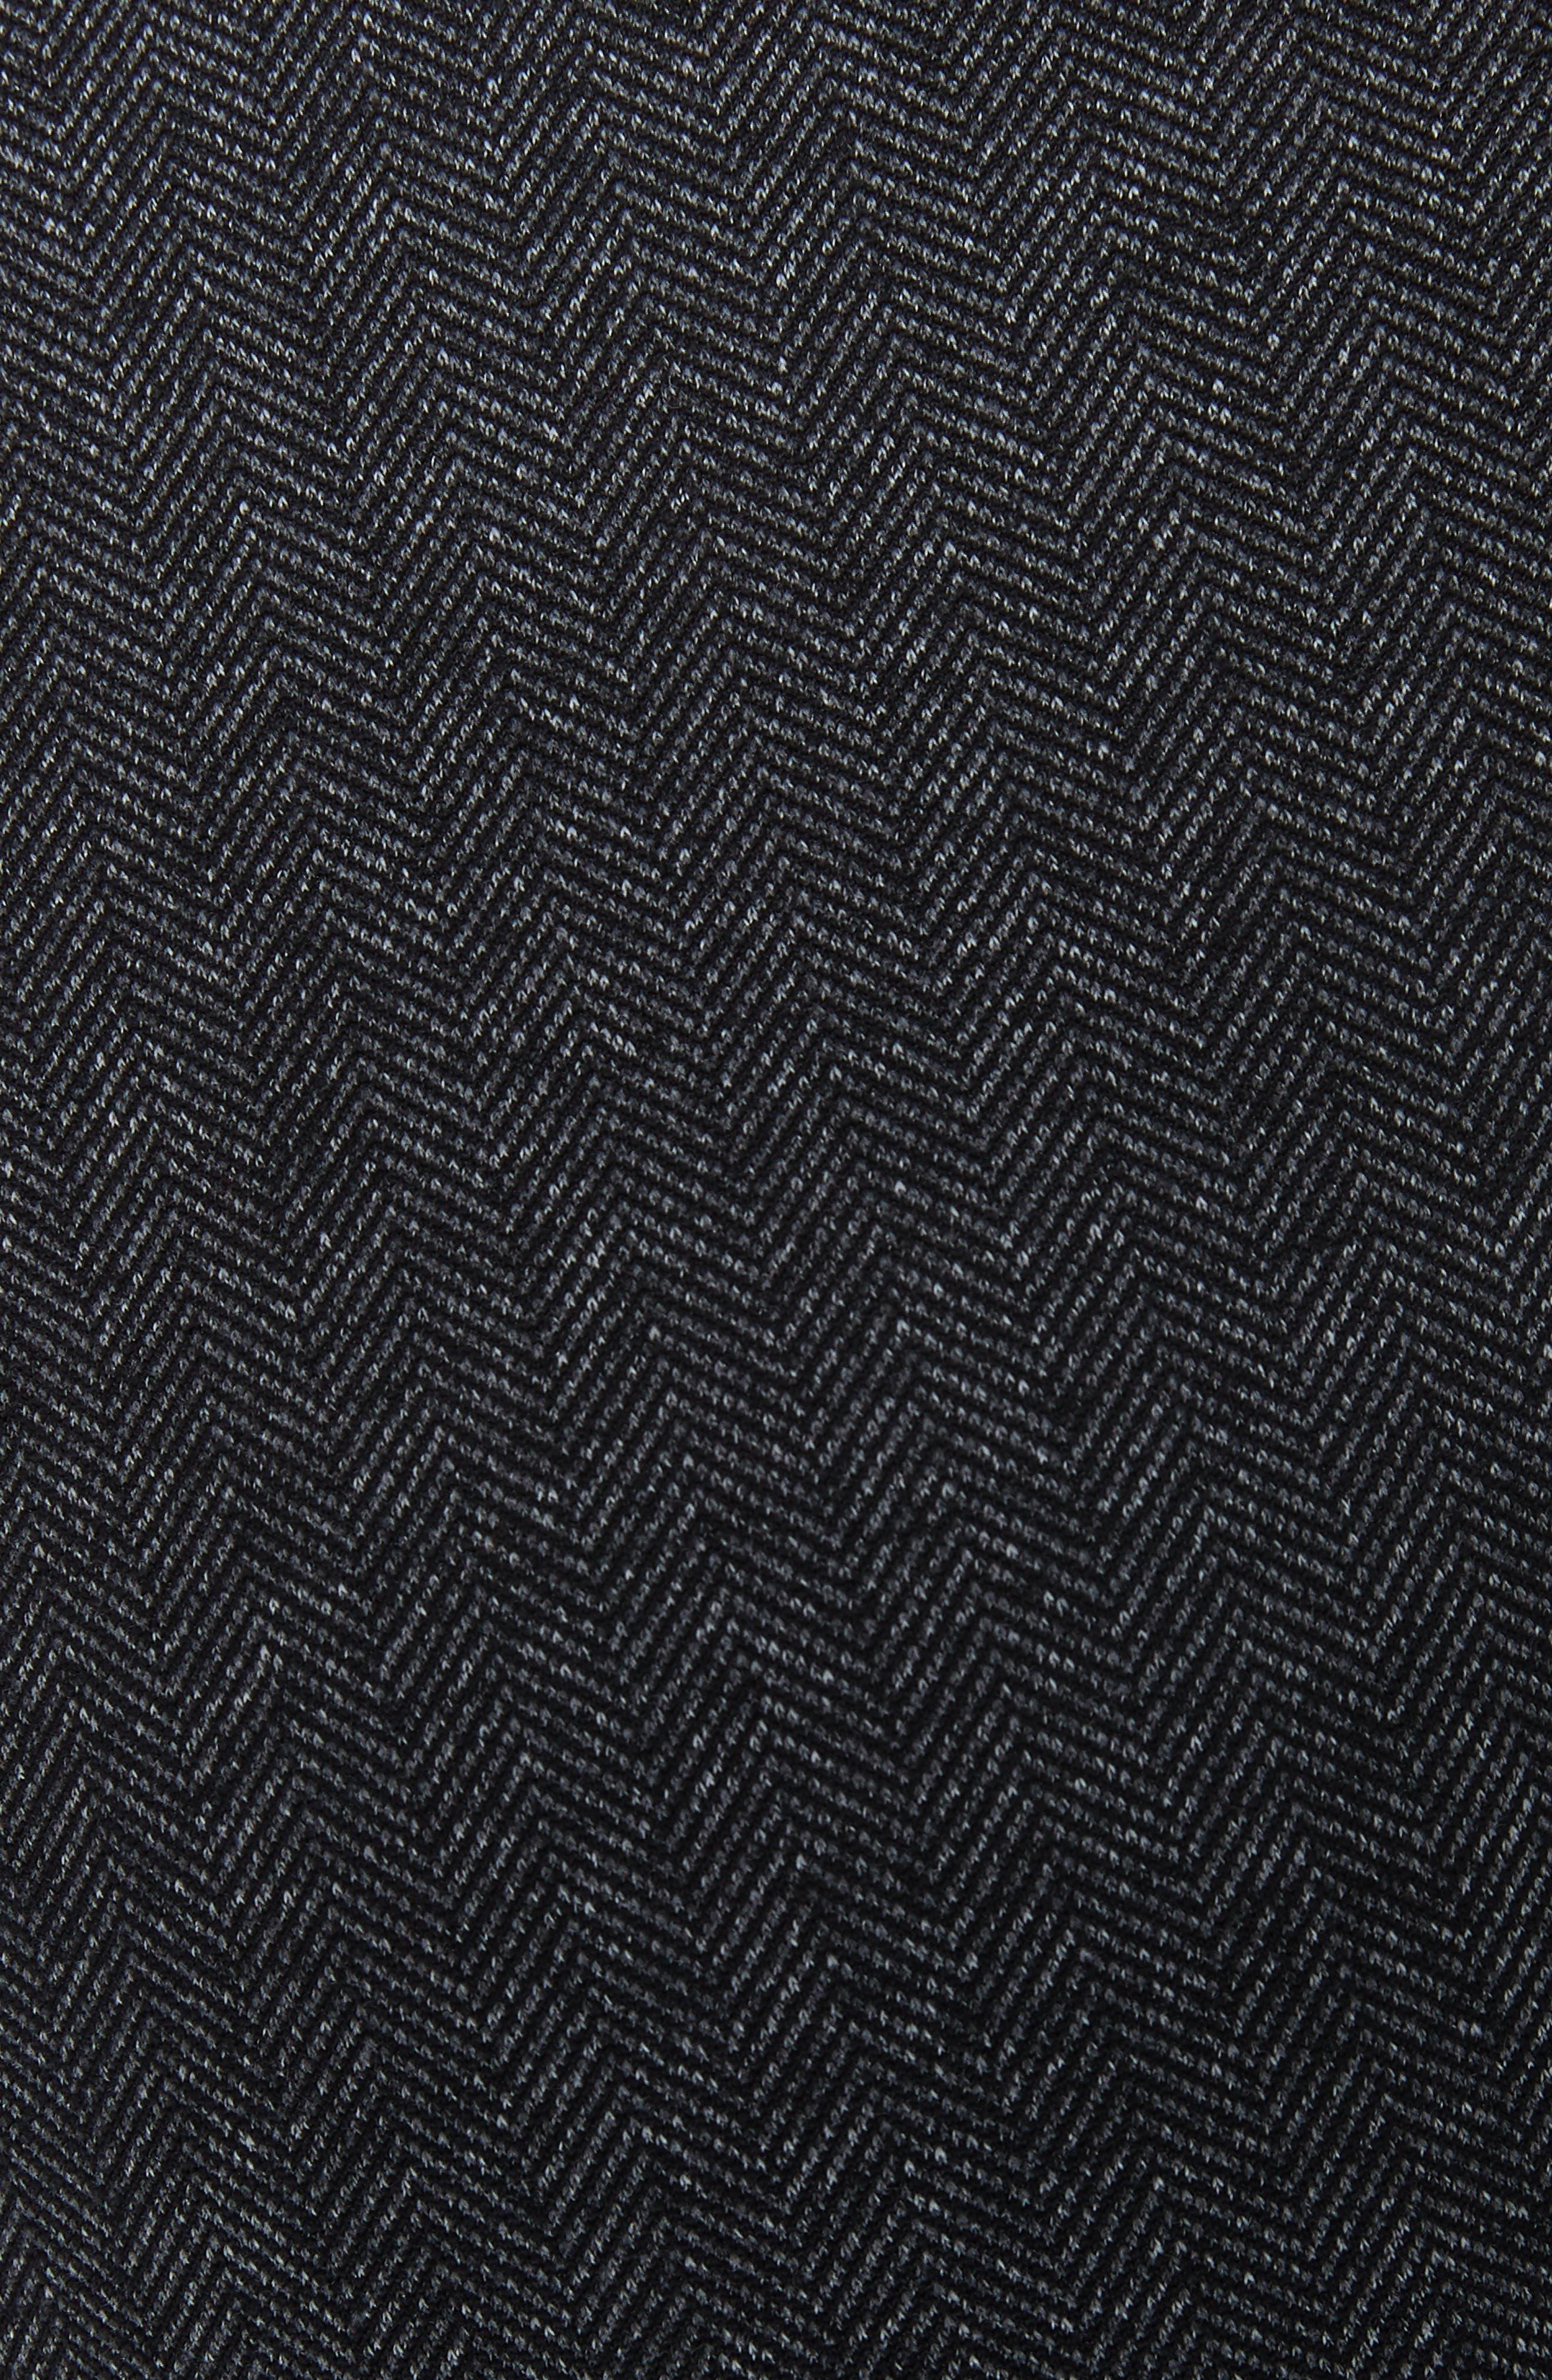 Contrast Panel Tweed Leggings,                             Alternate thumbnail 6, color,                             CHARCOAL